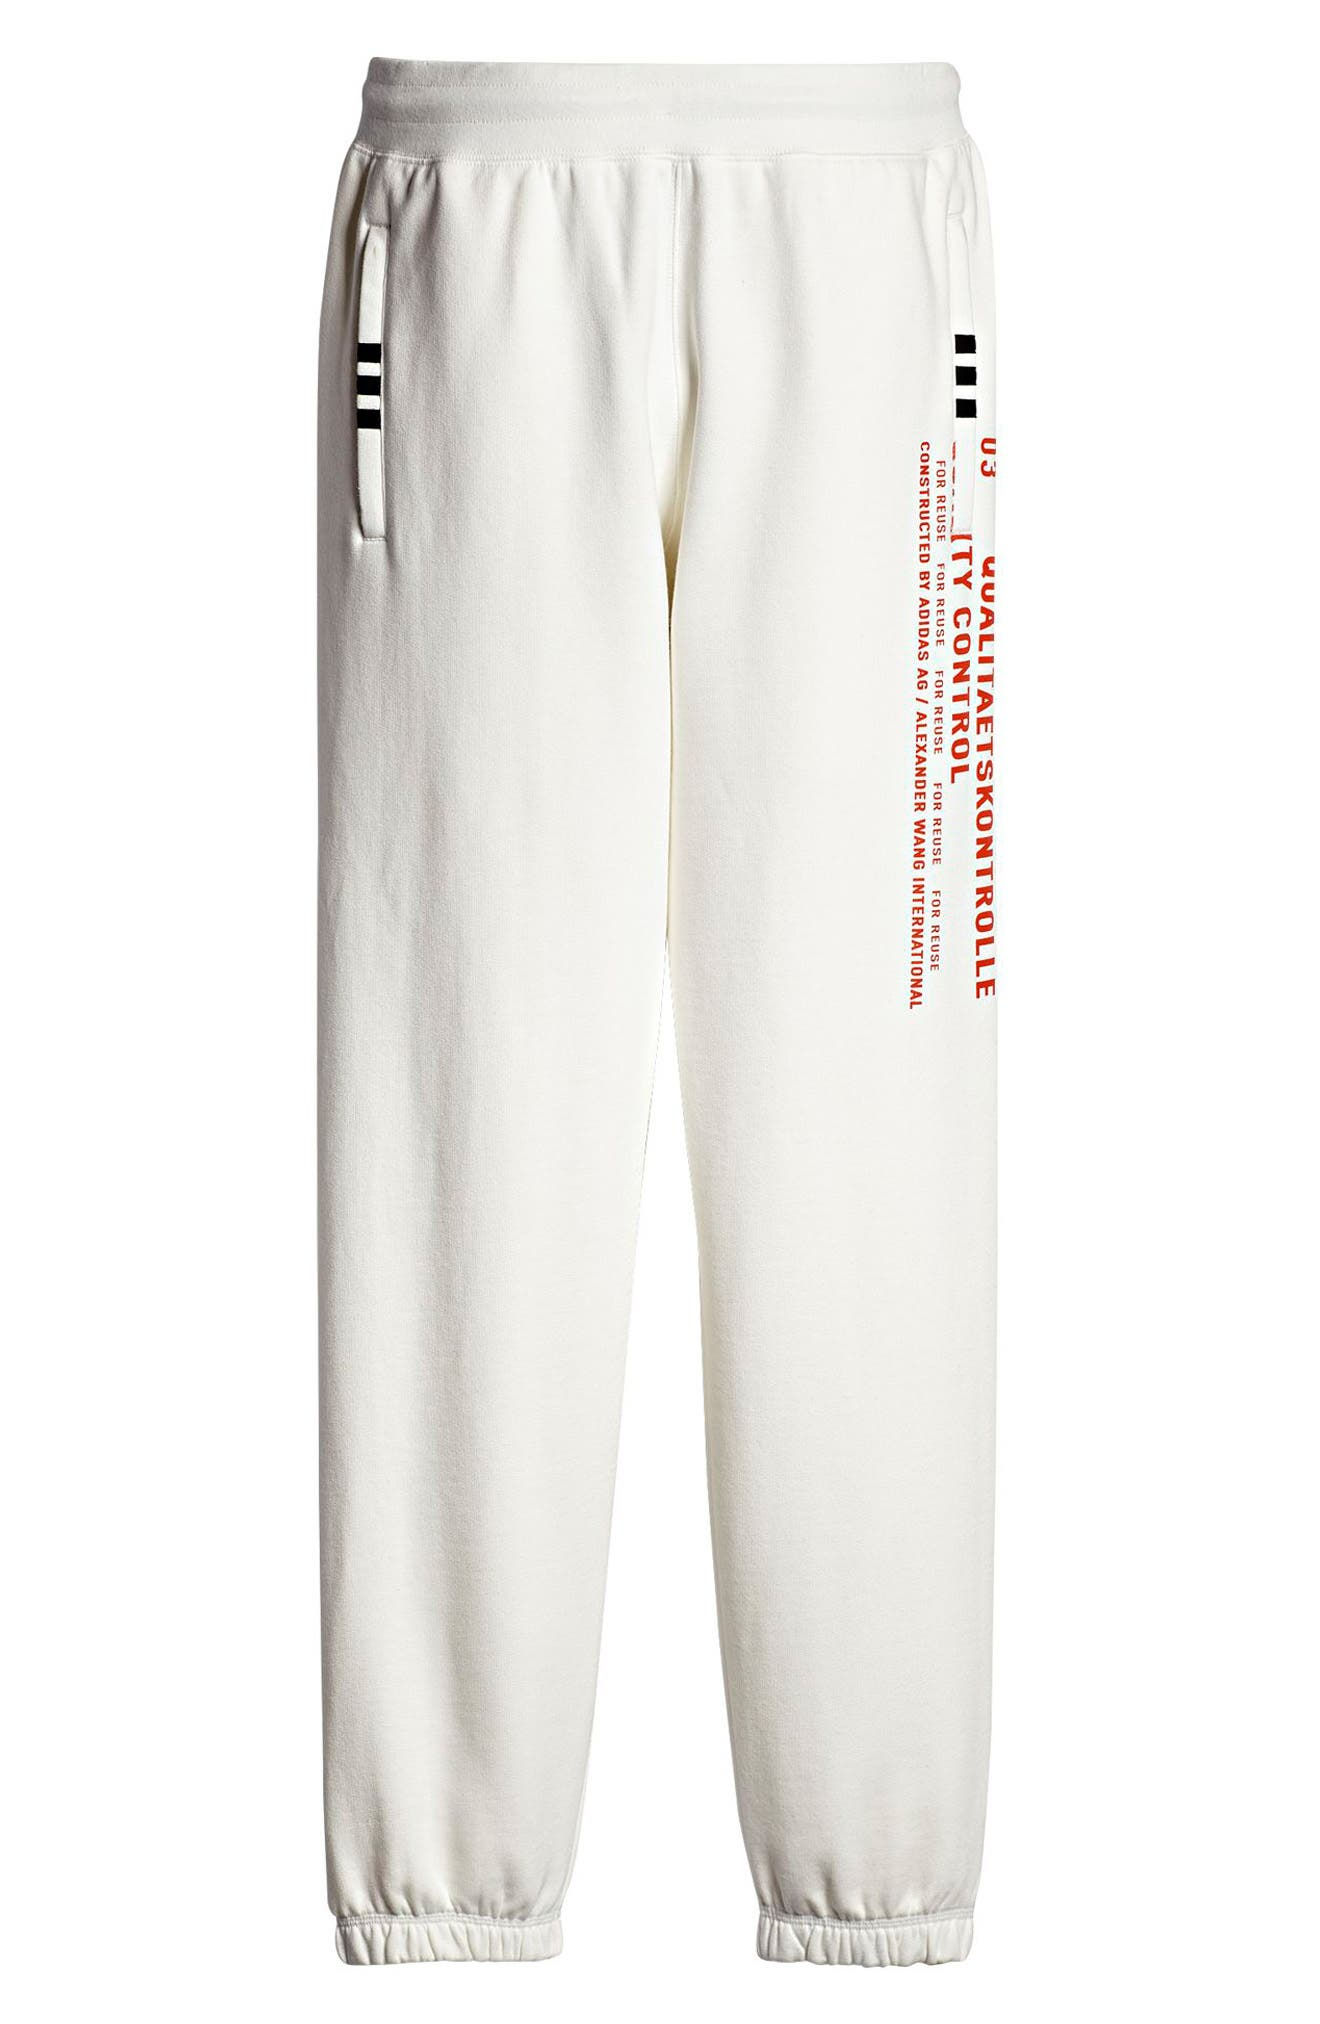 Graphite Jogger Pants,                             Alternate thumbnail 7, color,                             900